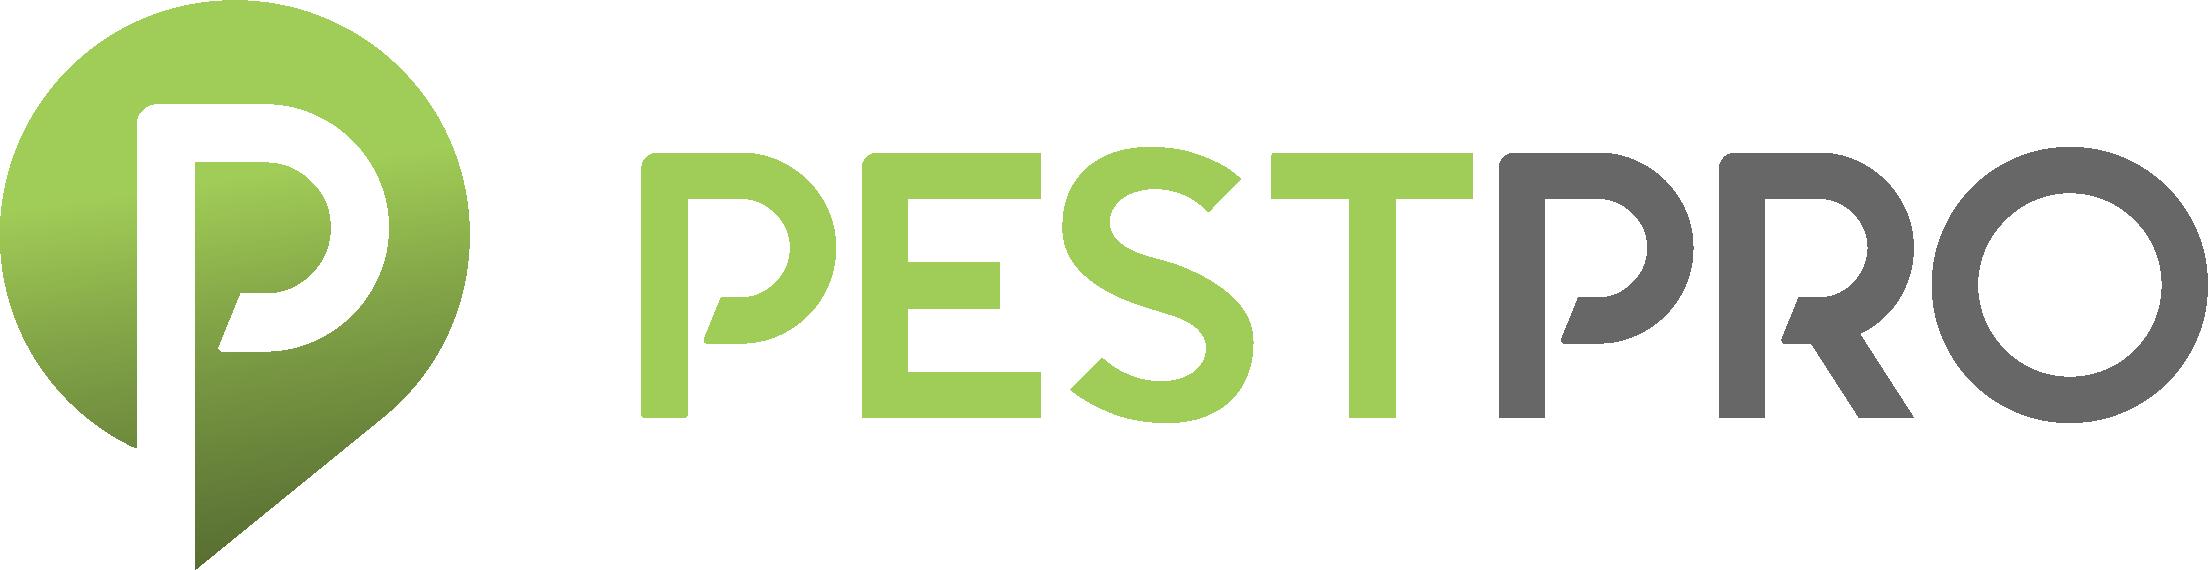 pest pro logo